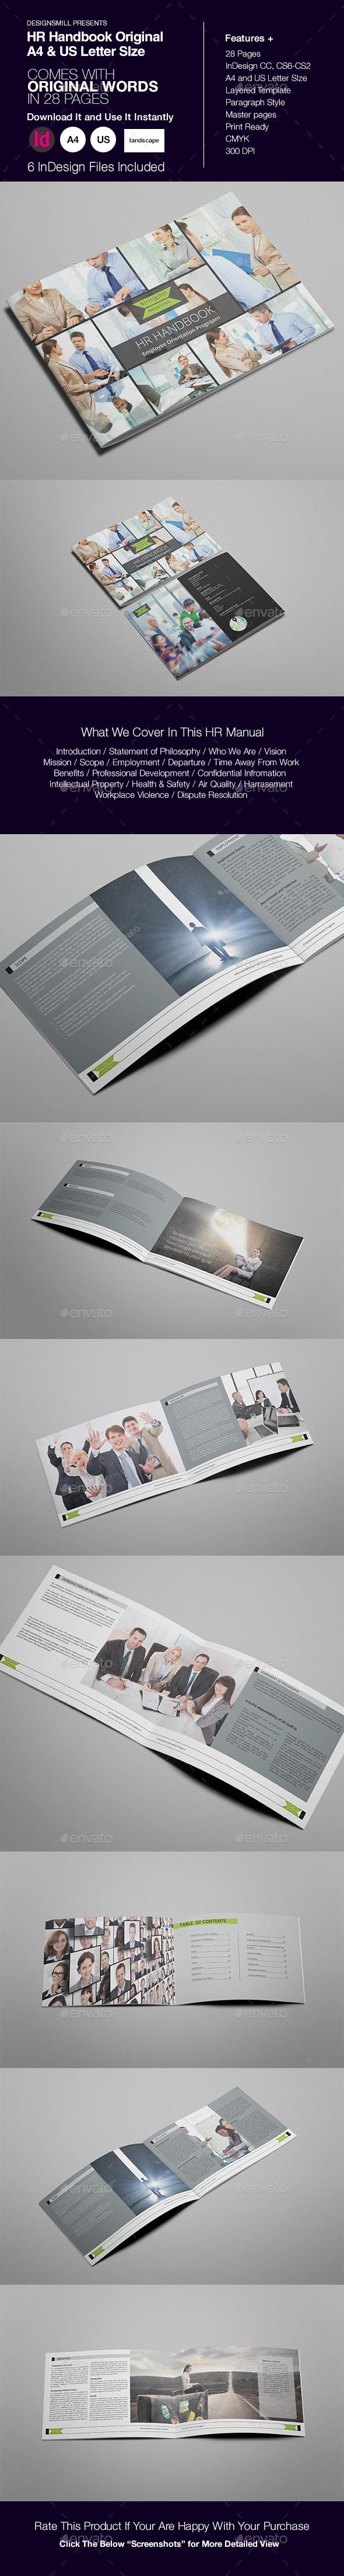 HR Handbook or Manual by designsmill | GraphicRiver